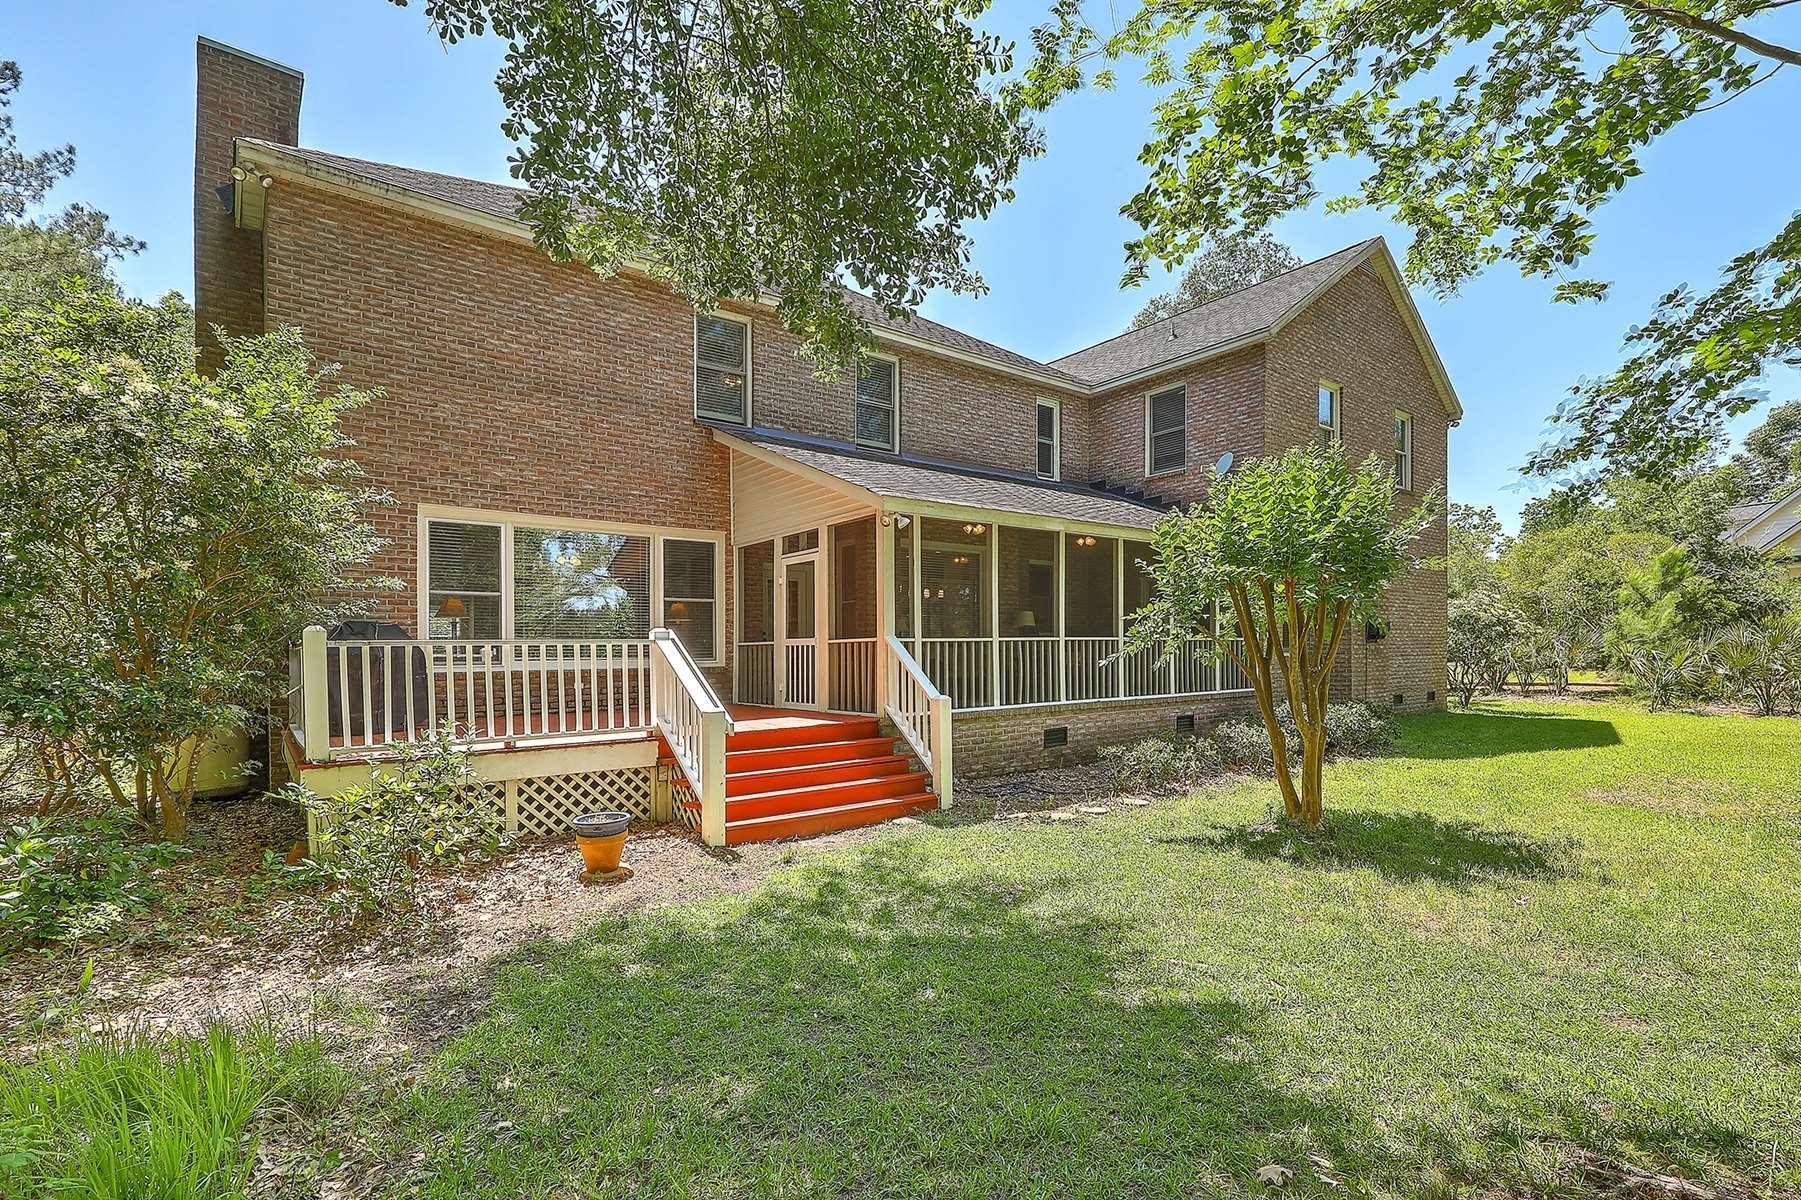 Dunes West Homes For Sale - 2961 Pignatelli, Mount Pleasant, SC - 29